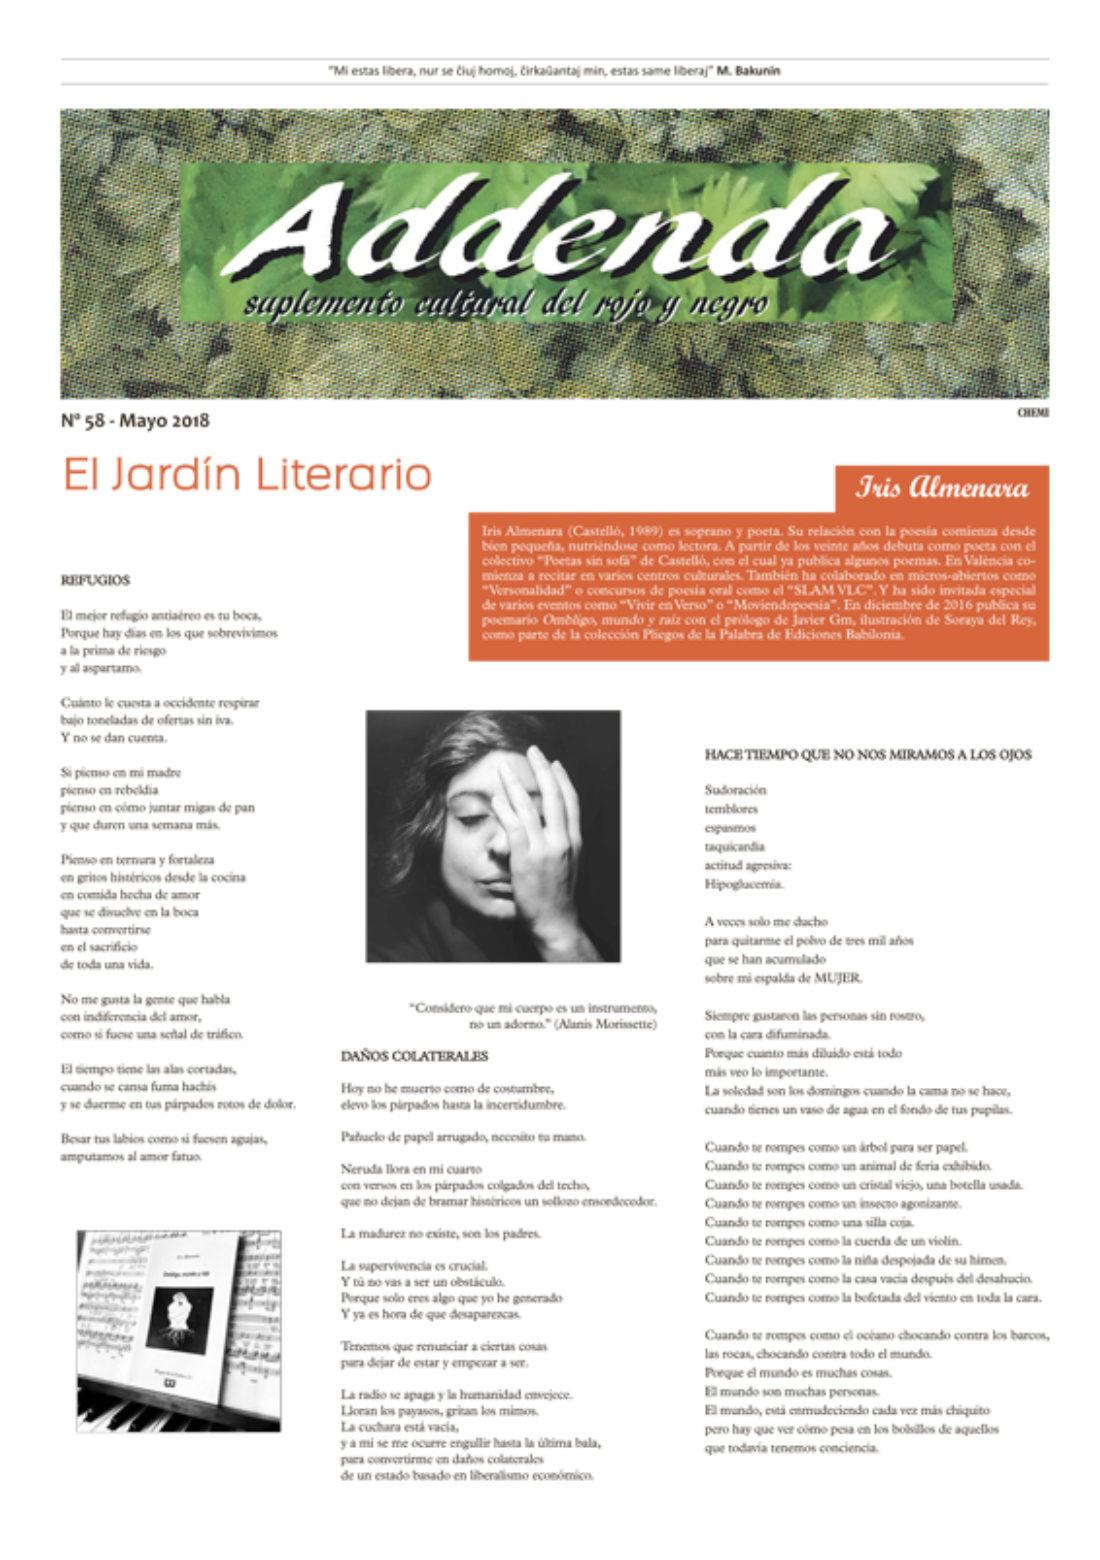 Addenda, suplemento cultural del RyN – Nº 58, mayo 2018